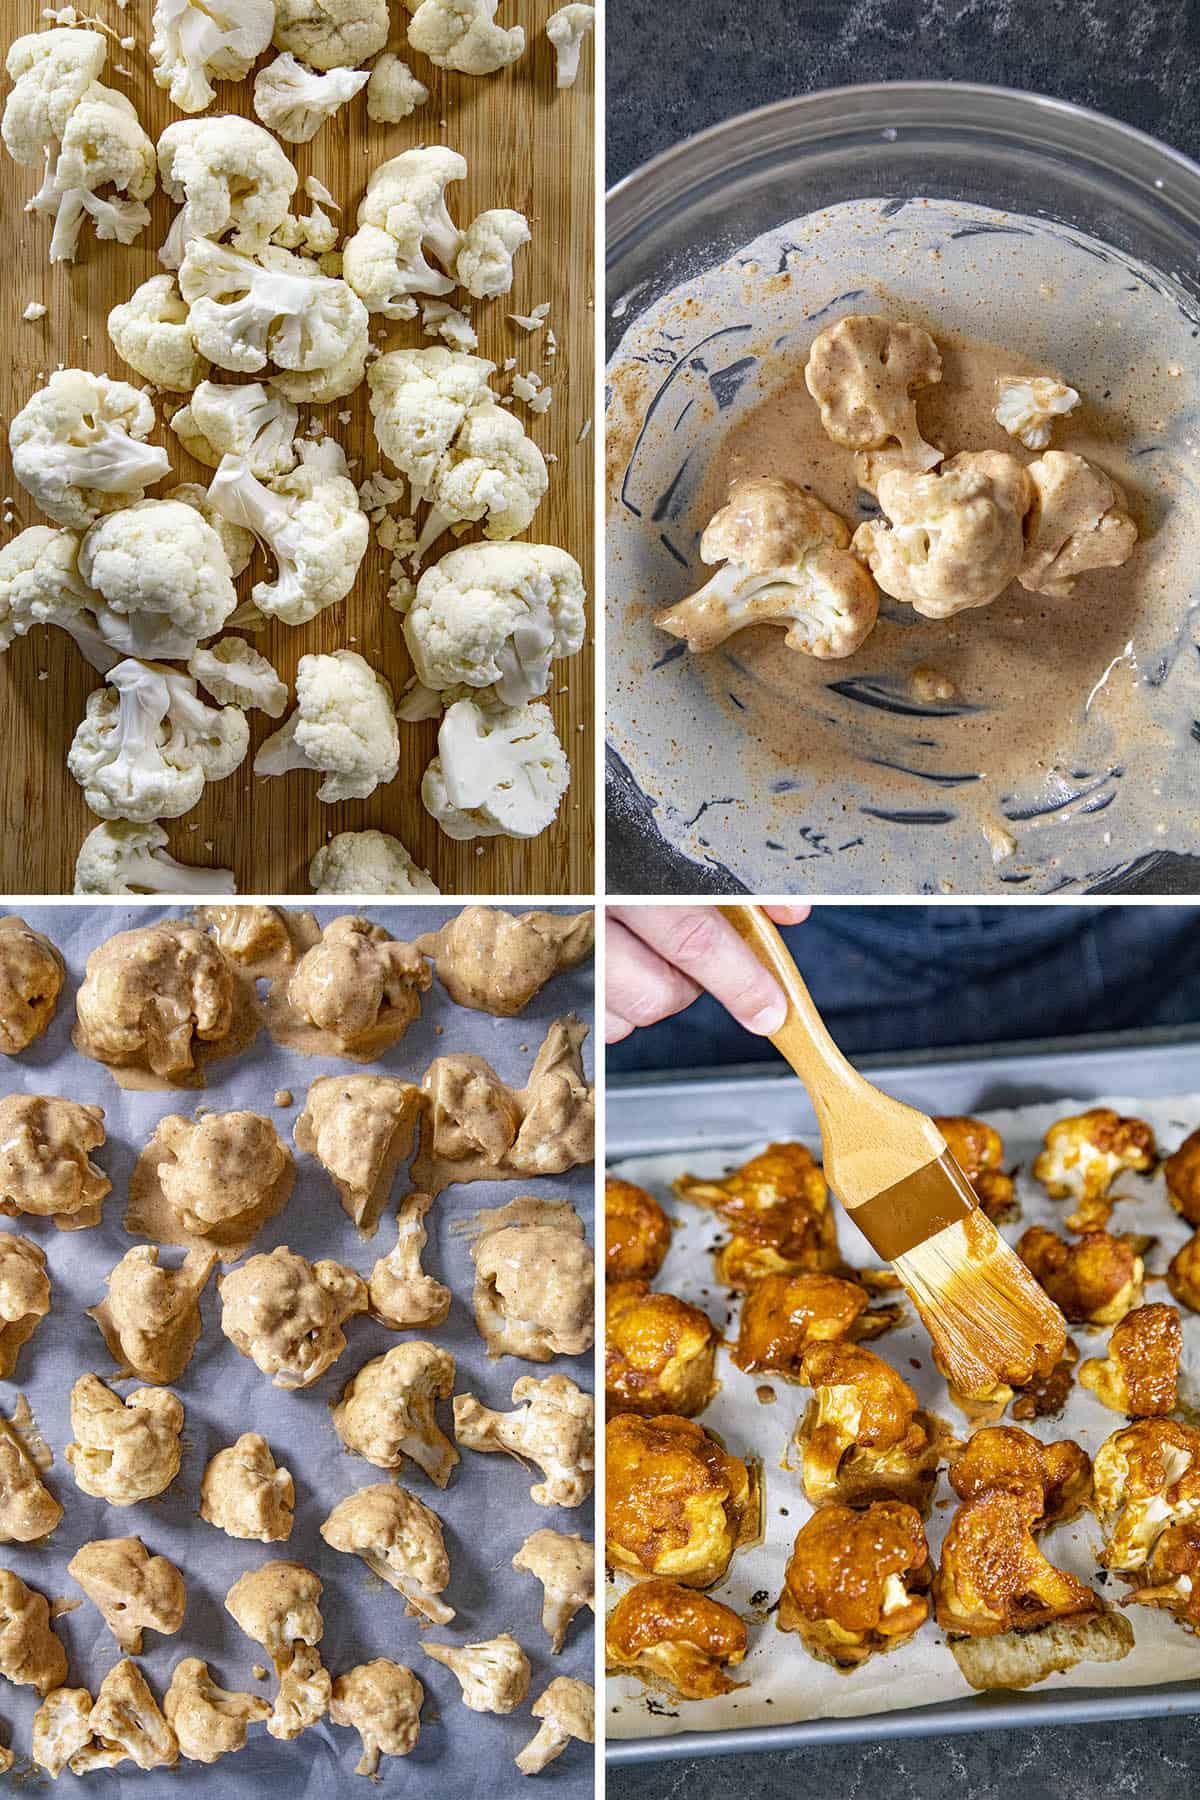 Steps for making Buffalo Cauliflower - slicing, battering, baking, brushing with Buffalo sauce